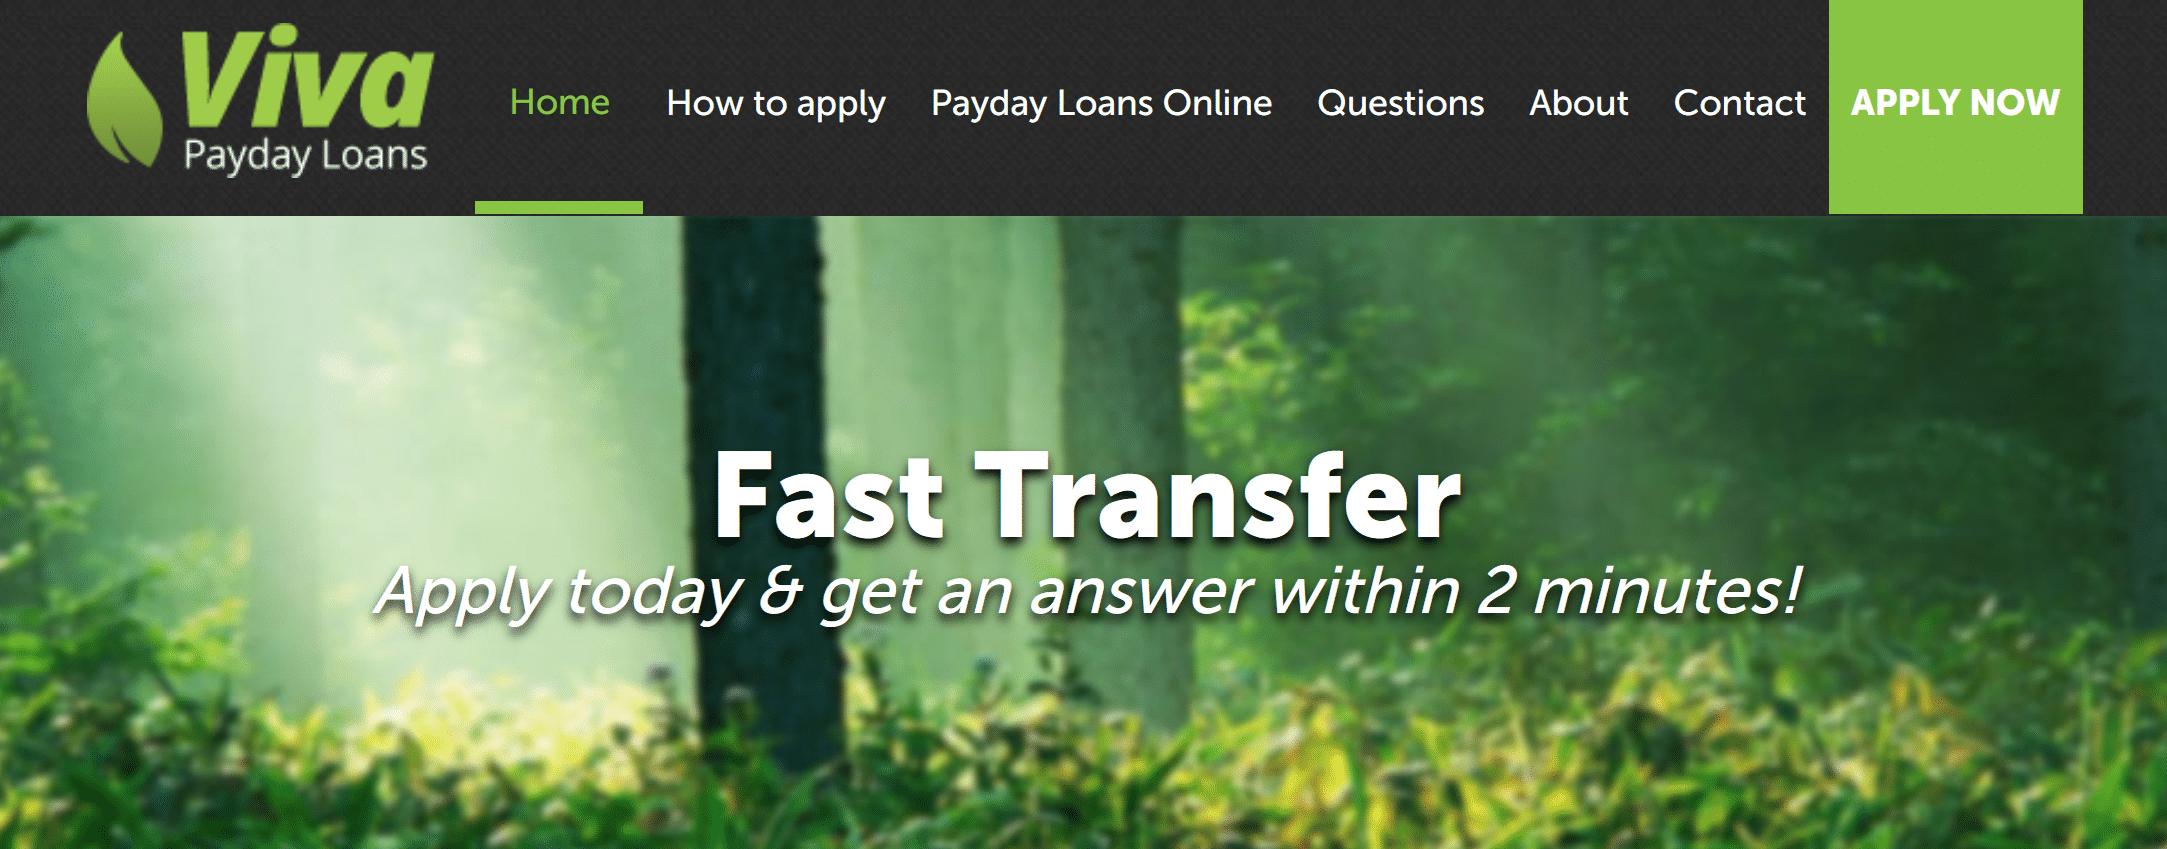 Installment Loans Direct Lenders | Bad Credit Direct Lenders Only List